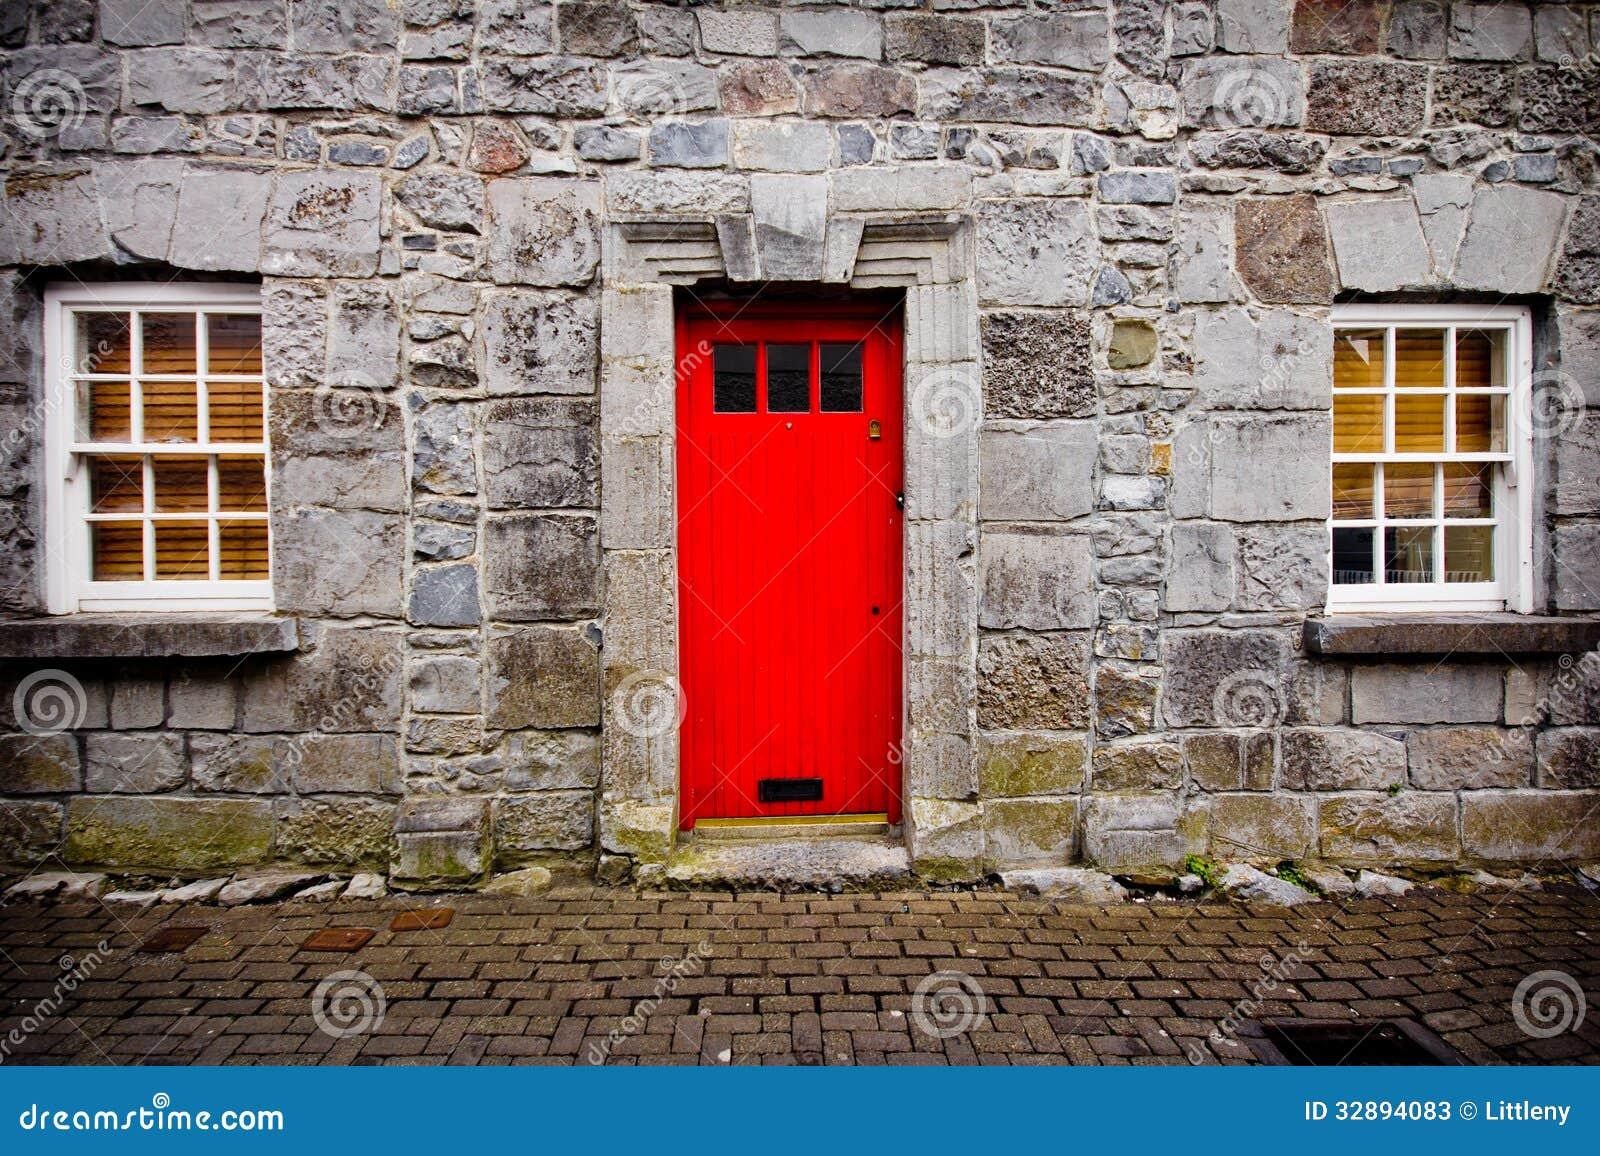 Red door stone house stock photos image 32894083 for Door of stone